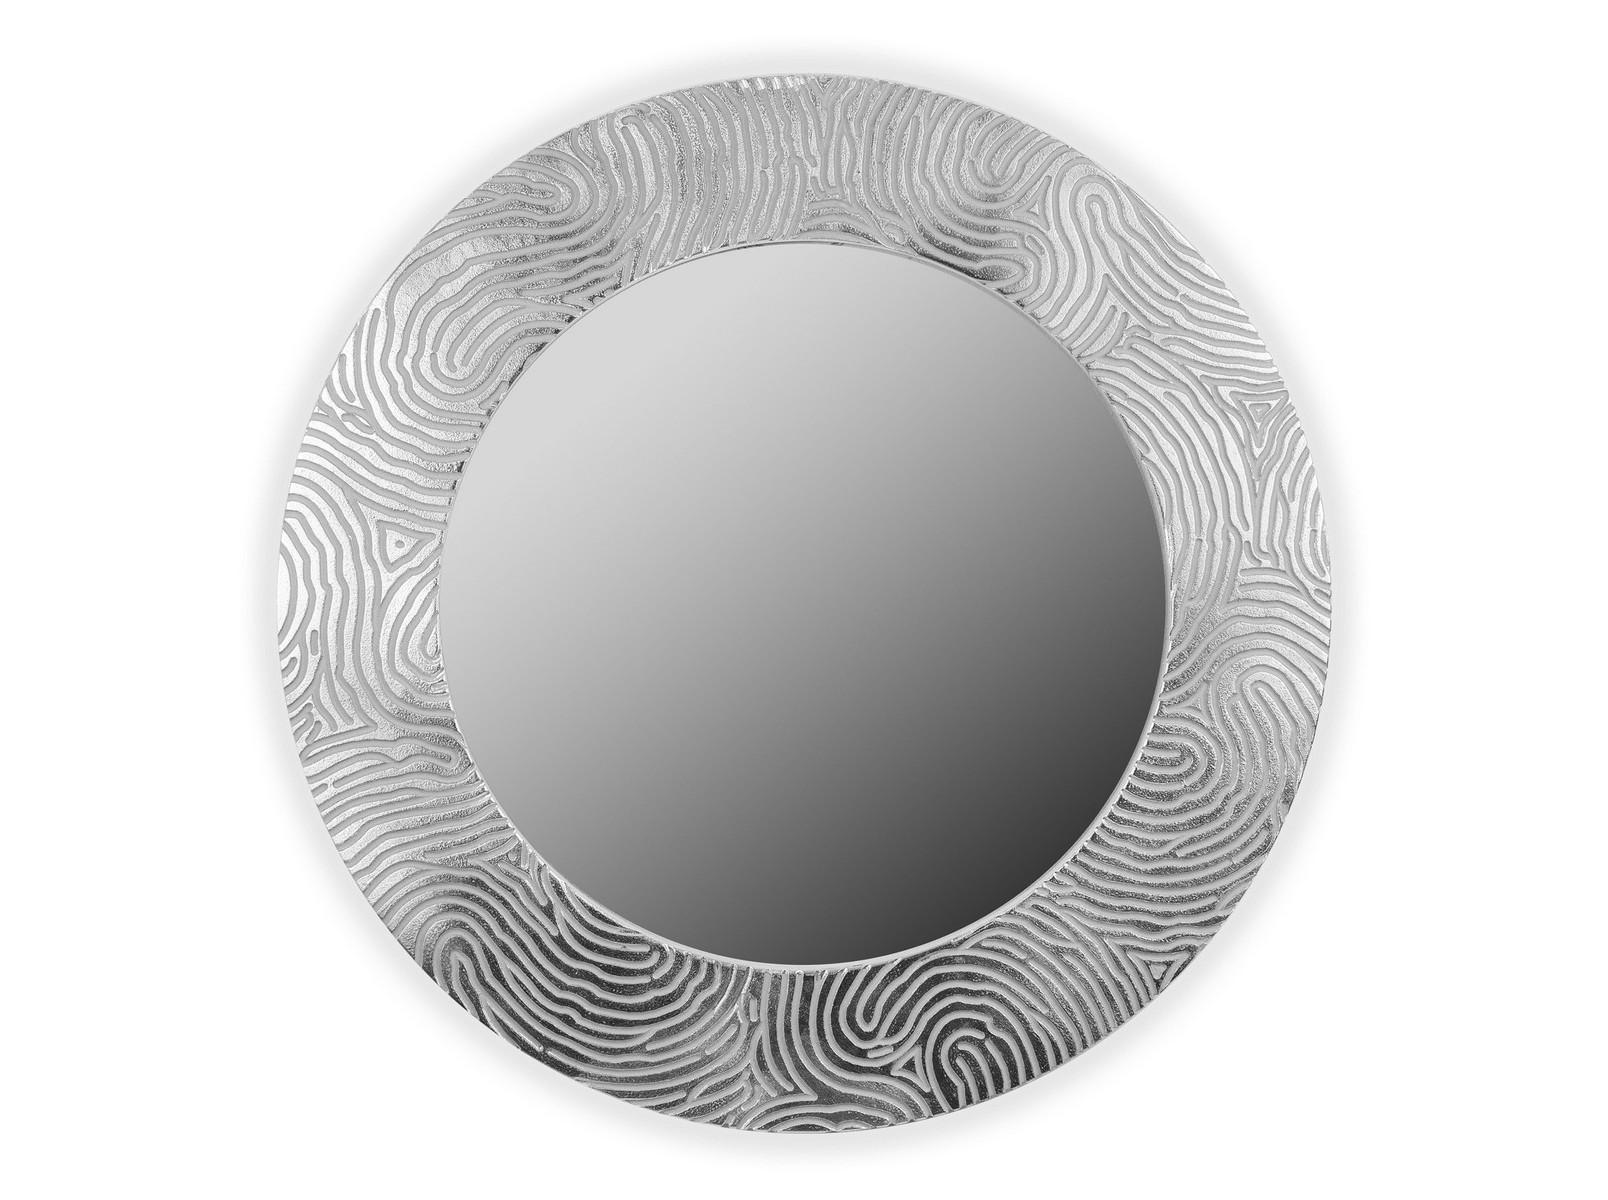 Зеркало FASHION MARKНастенные зеркала<br><br><br>Material: Дерево<br>Глубина см: 2